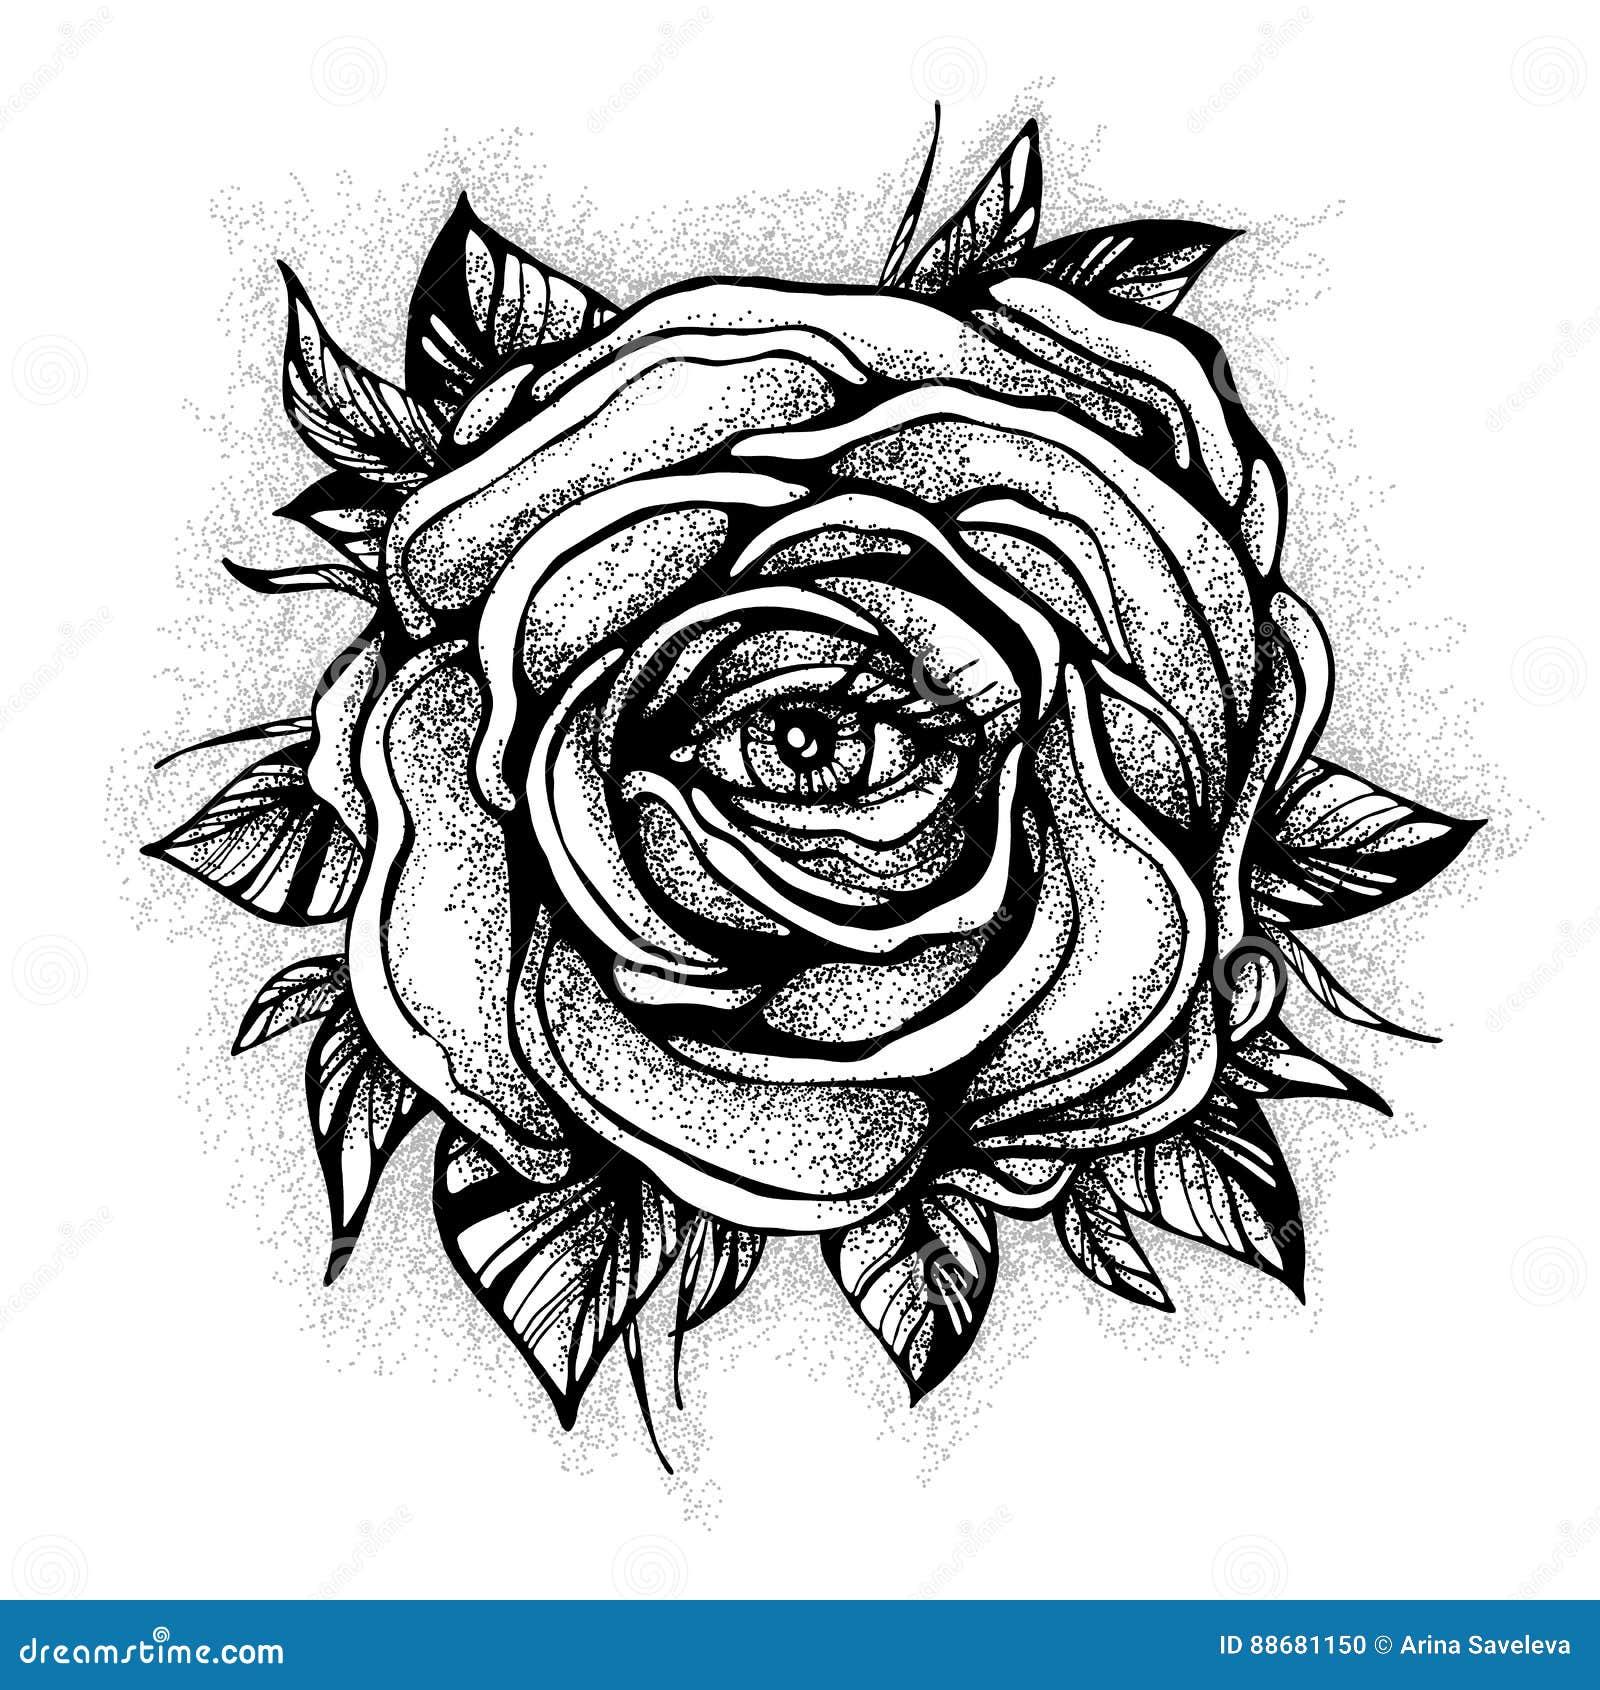 Dessin rose noir et blanc galerie tatouage - Tattoo rose noir ...